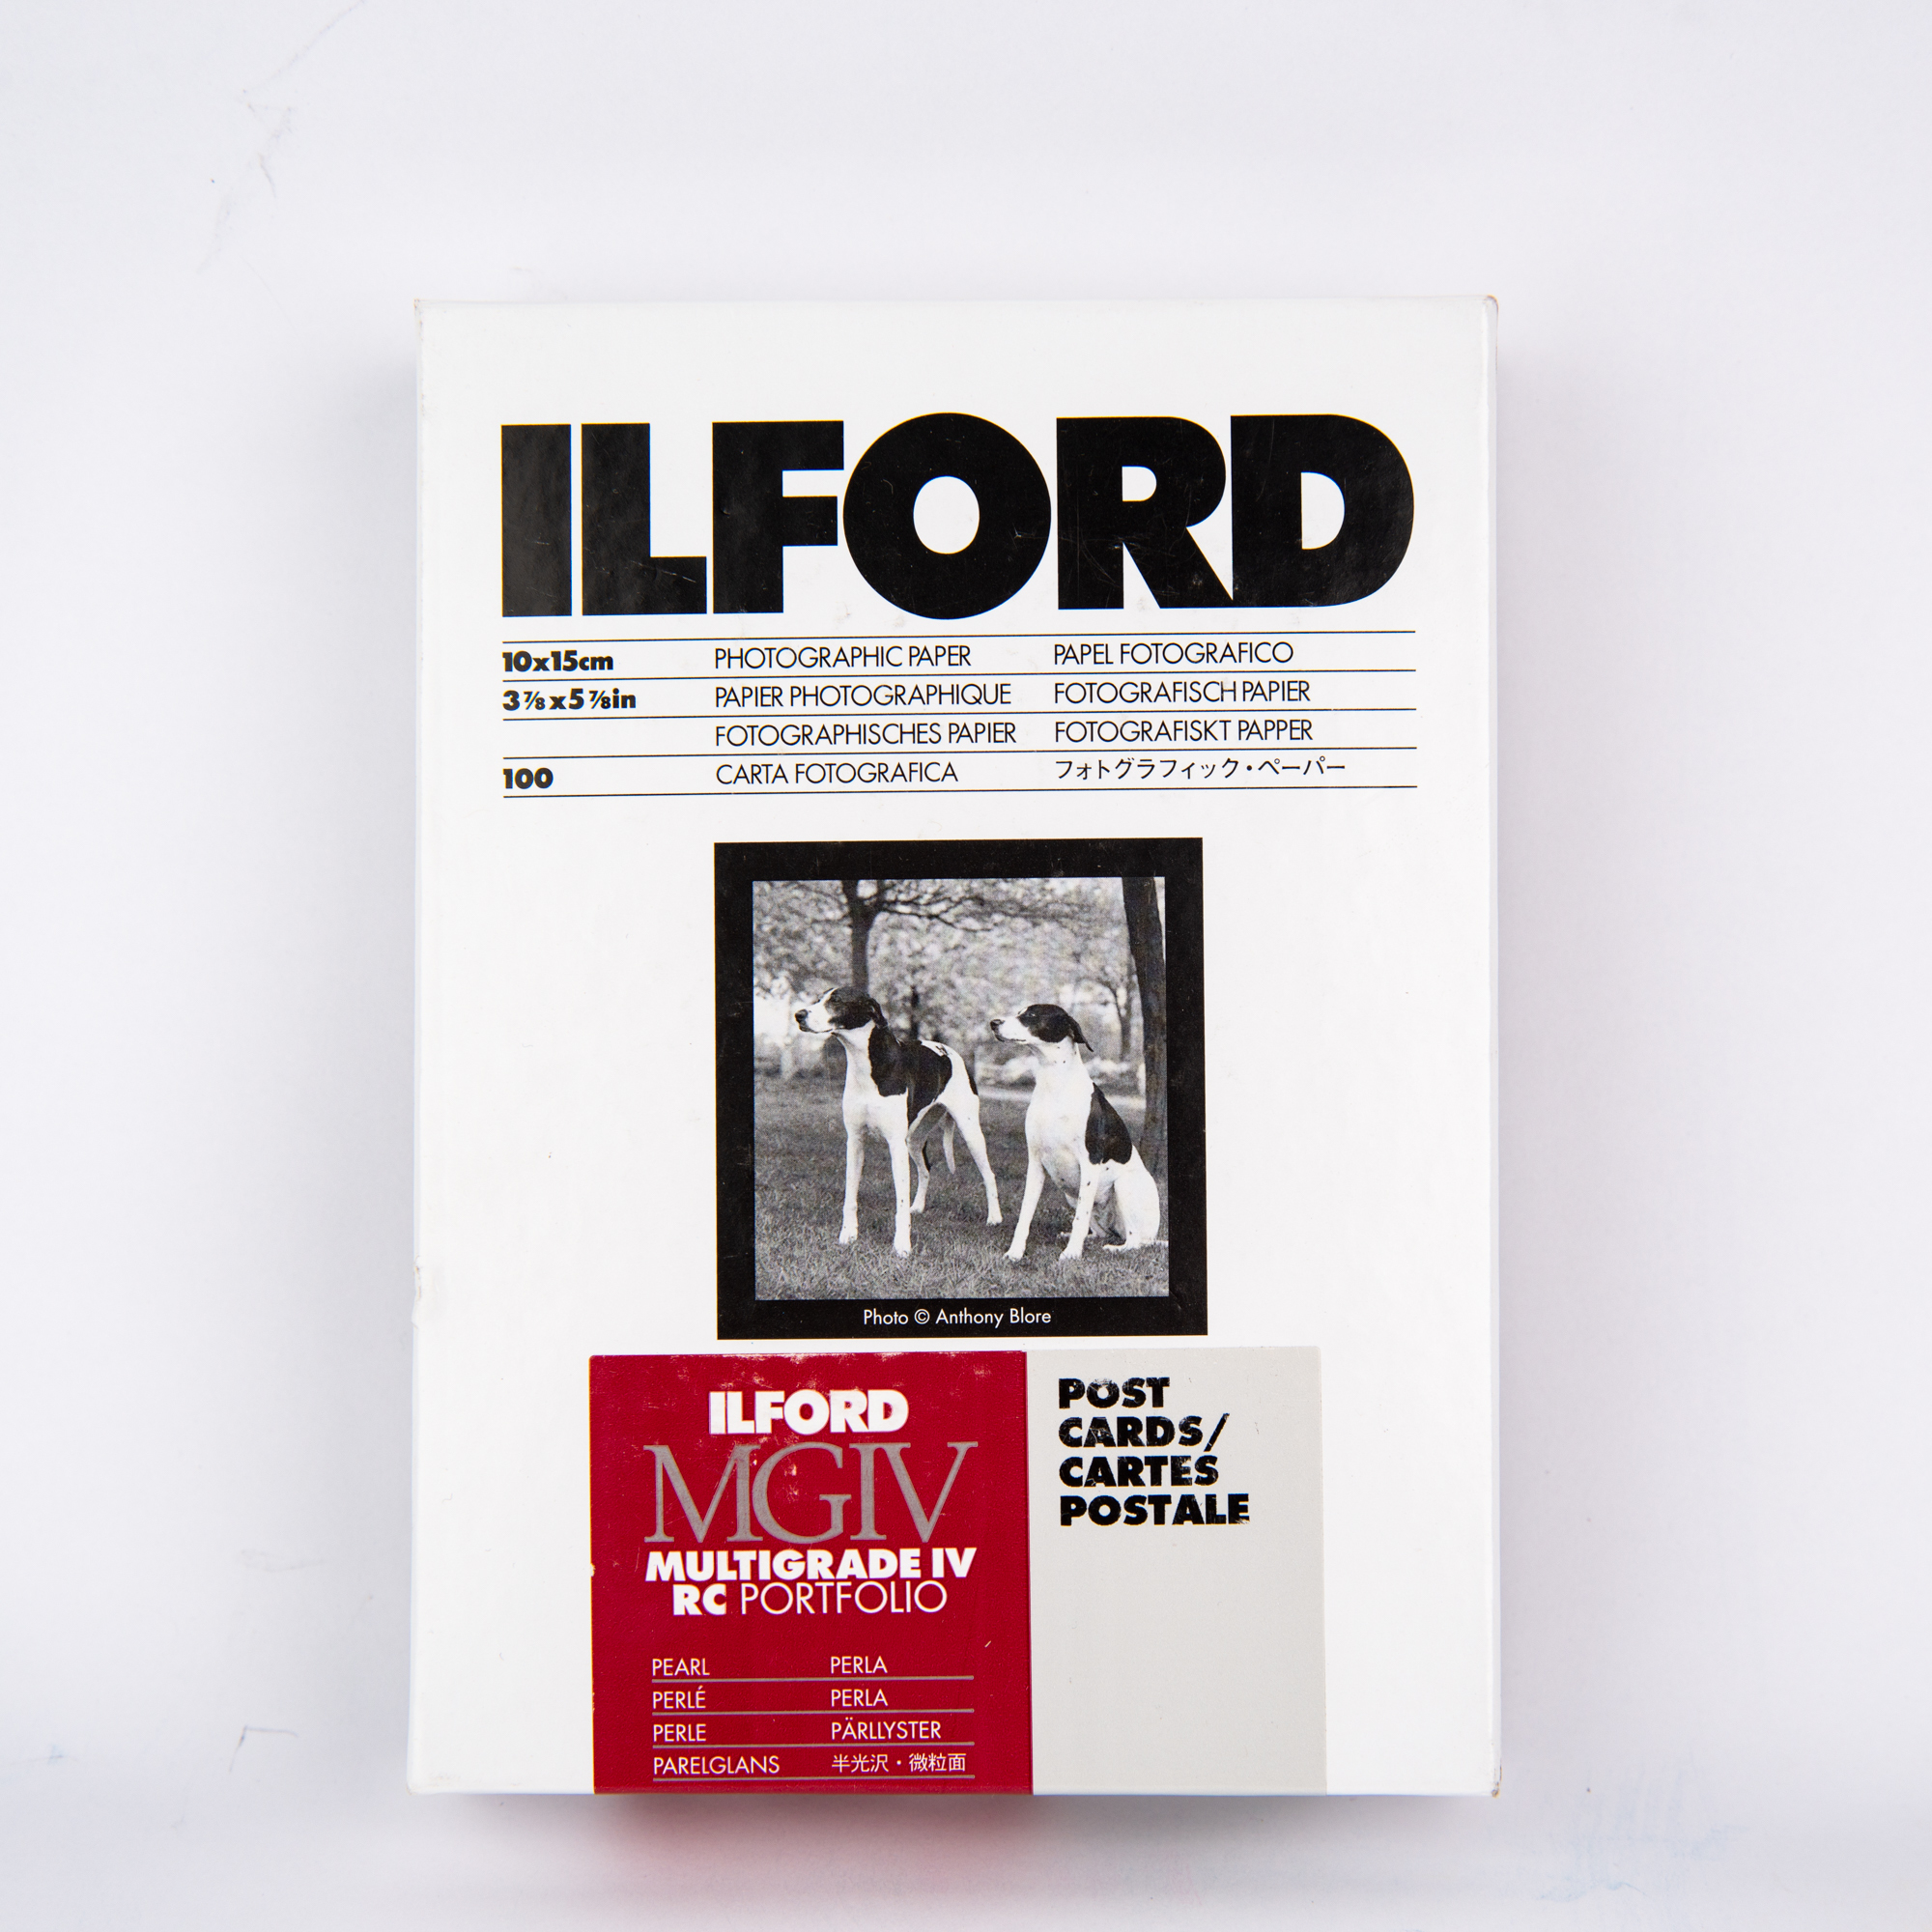 Фотобумага Ilford MGIV RC Portfolio Pearl для открыток, 10х15 см, 100 листов